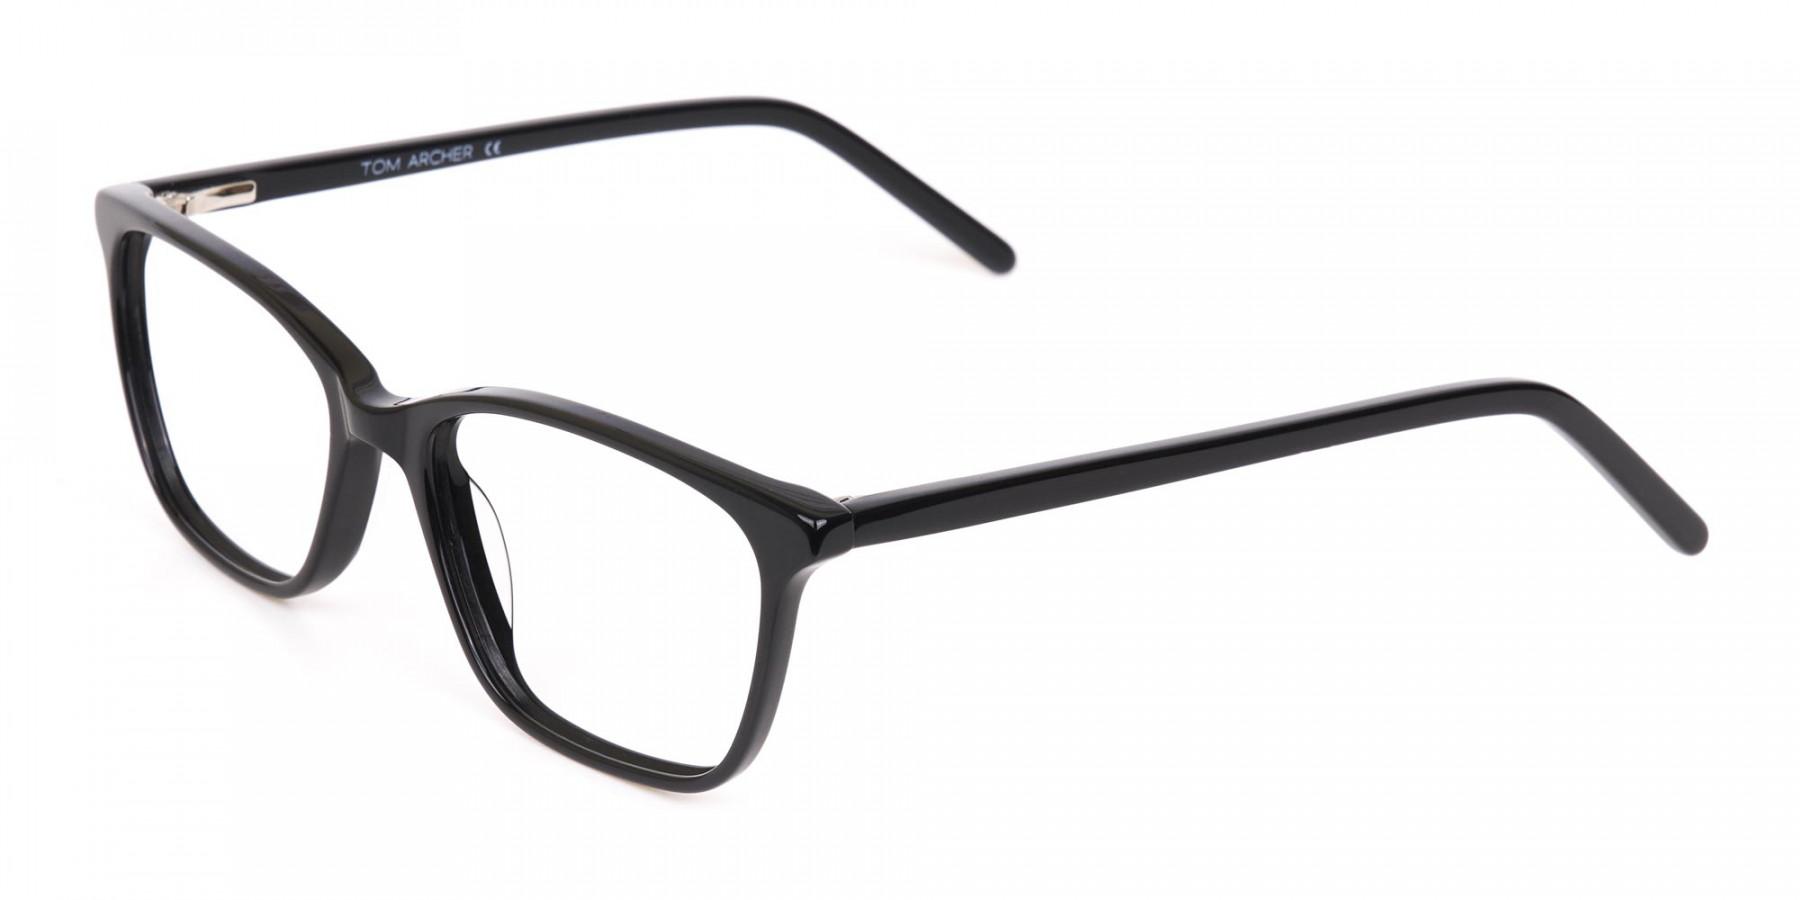 Black Rectangular Acetate Eyeglasses Unisex-1